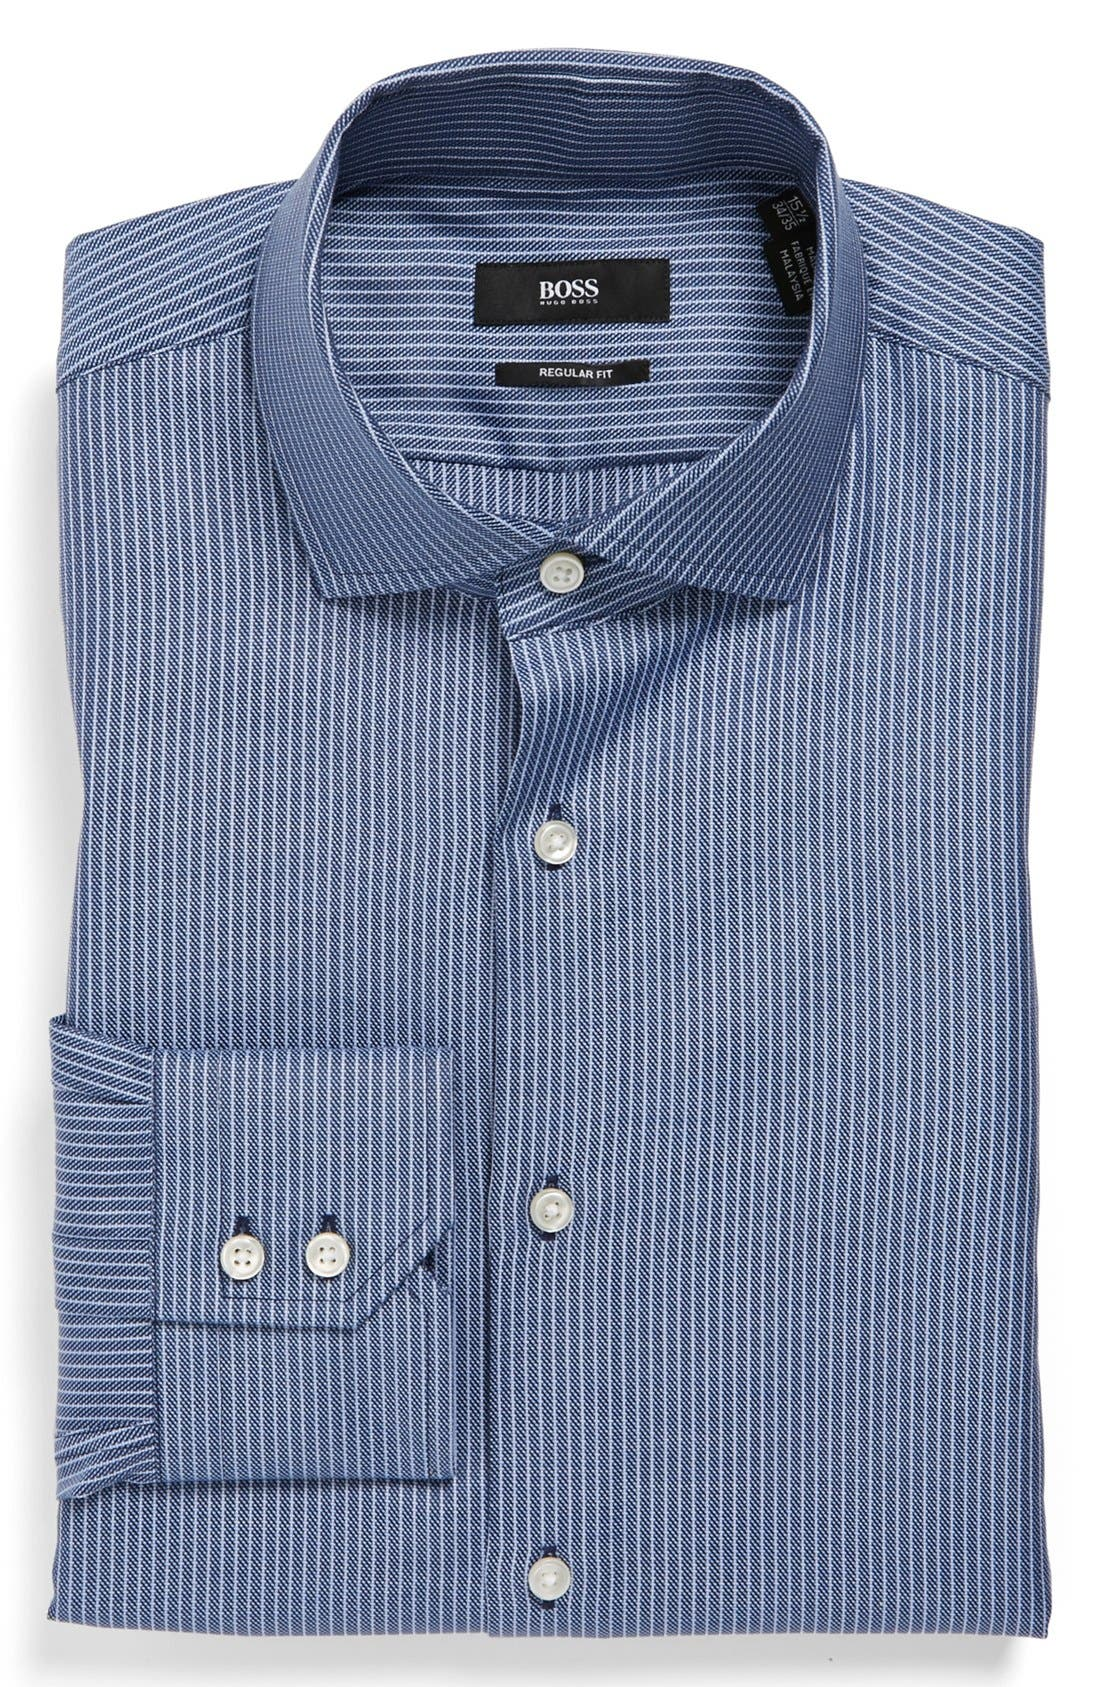 Main Image - BOSS HUGO BOSS 'Gordon' US Regular Fit Dress Shirt